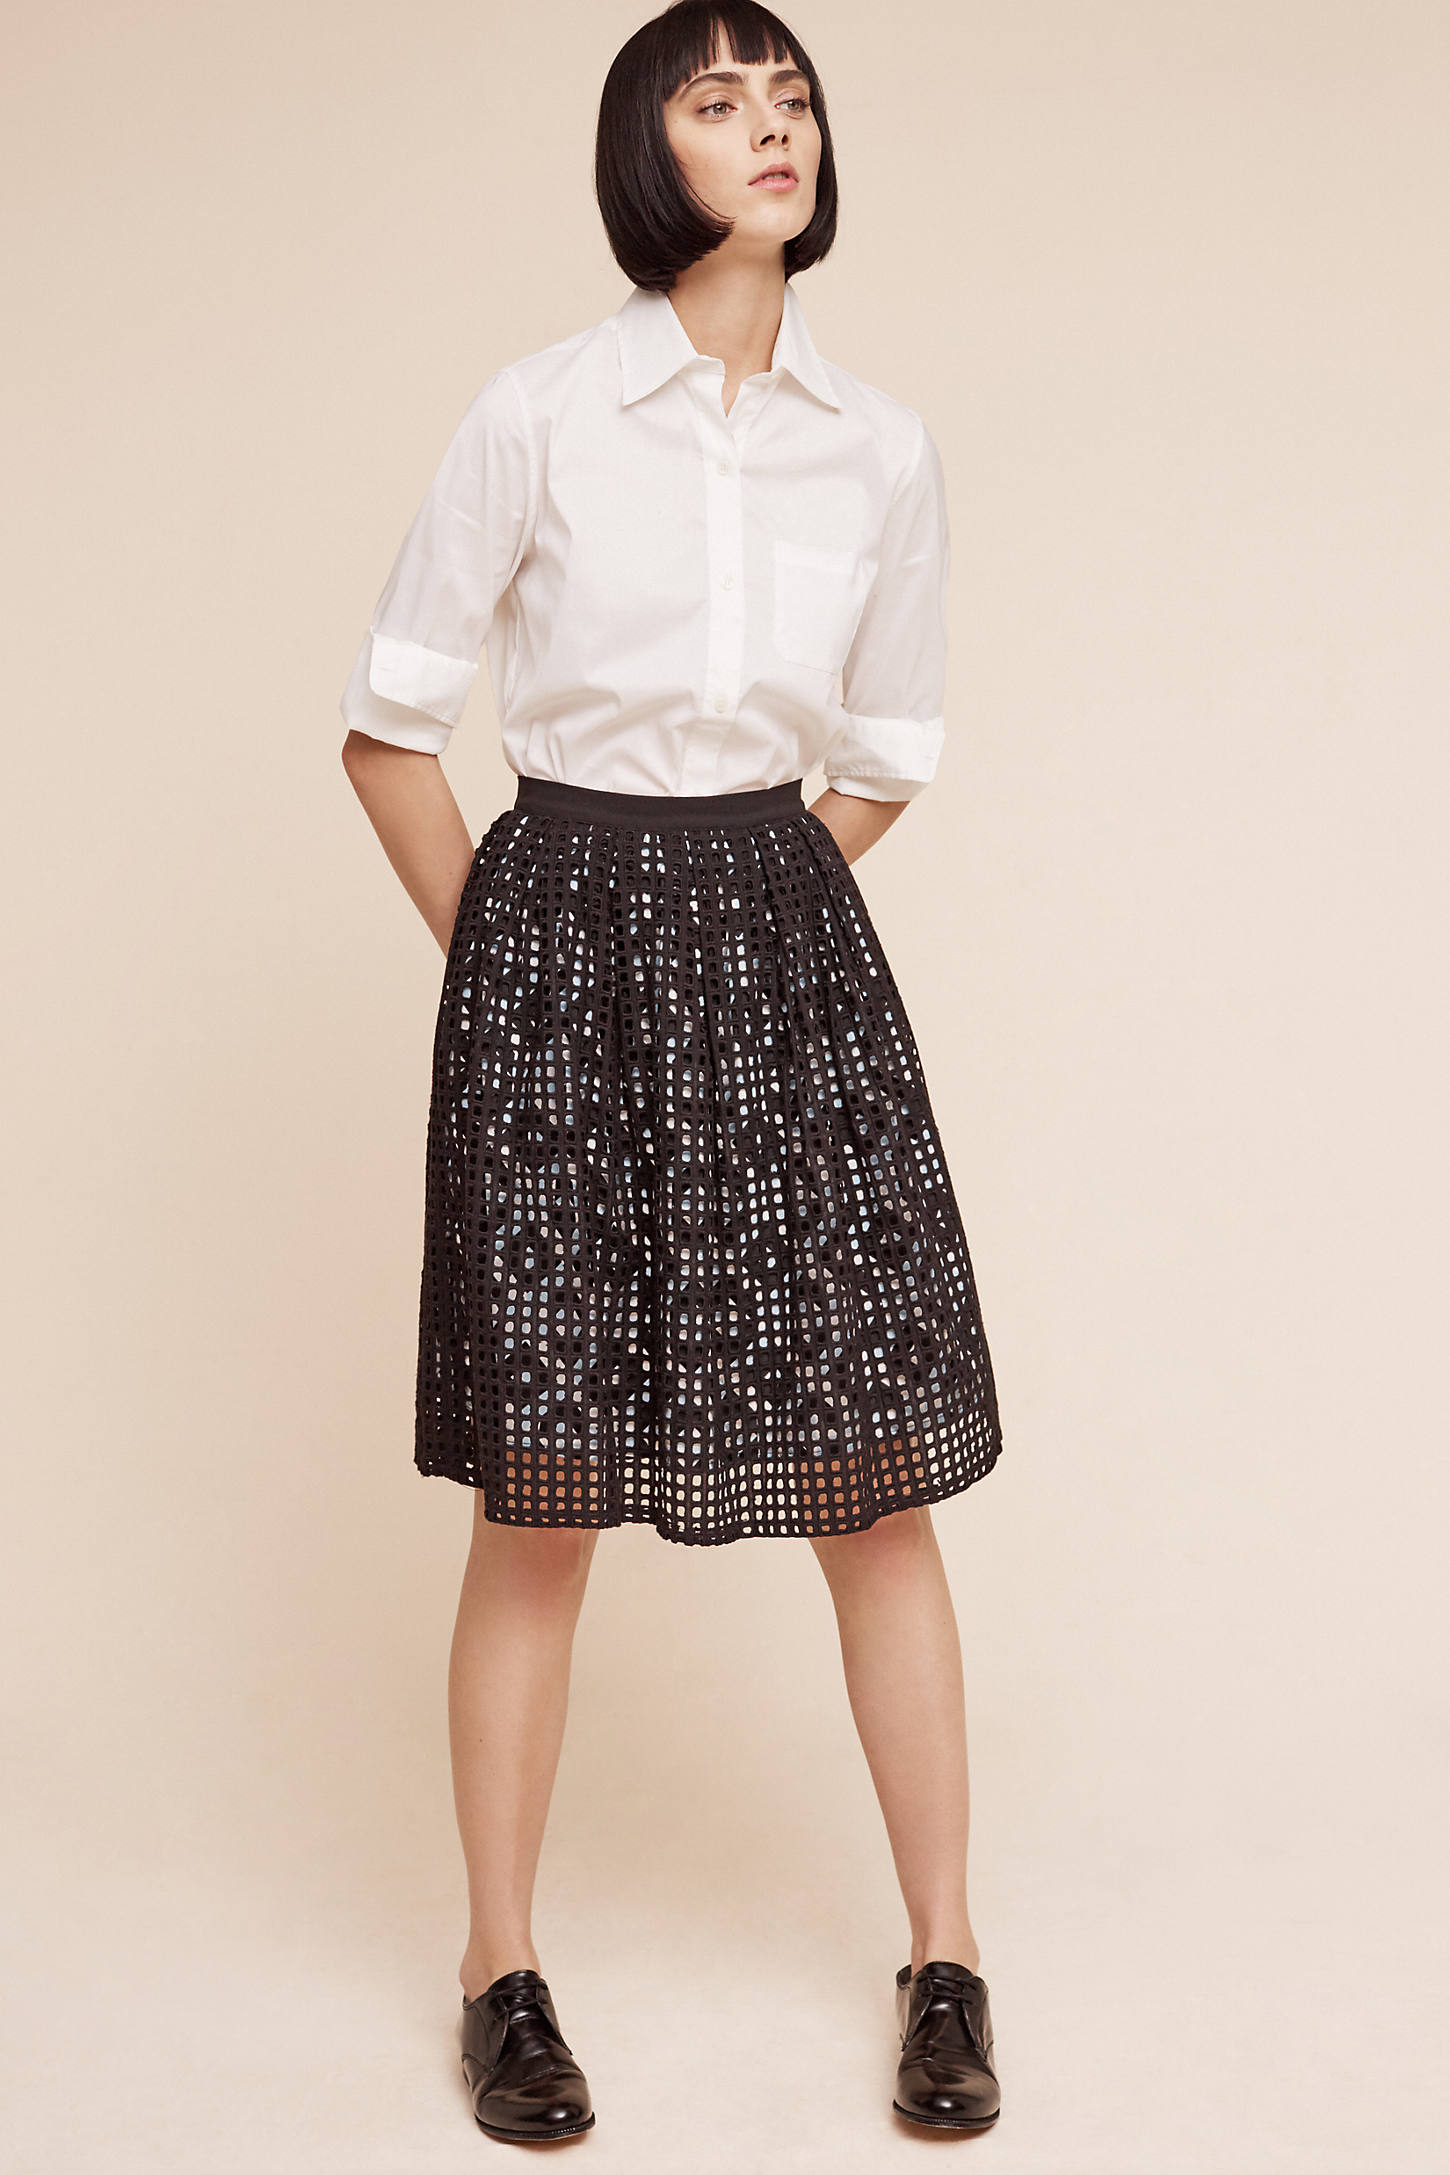 Viewfinder Skirt